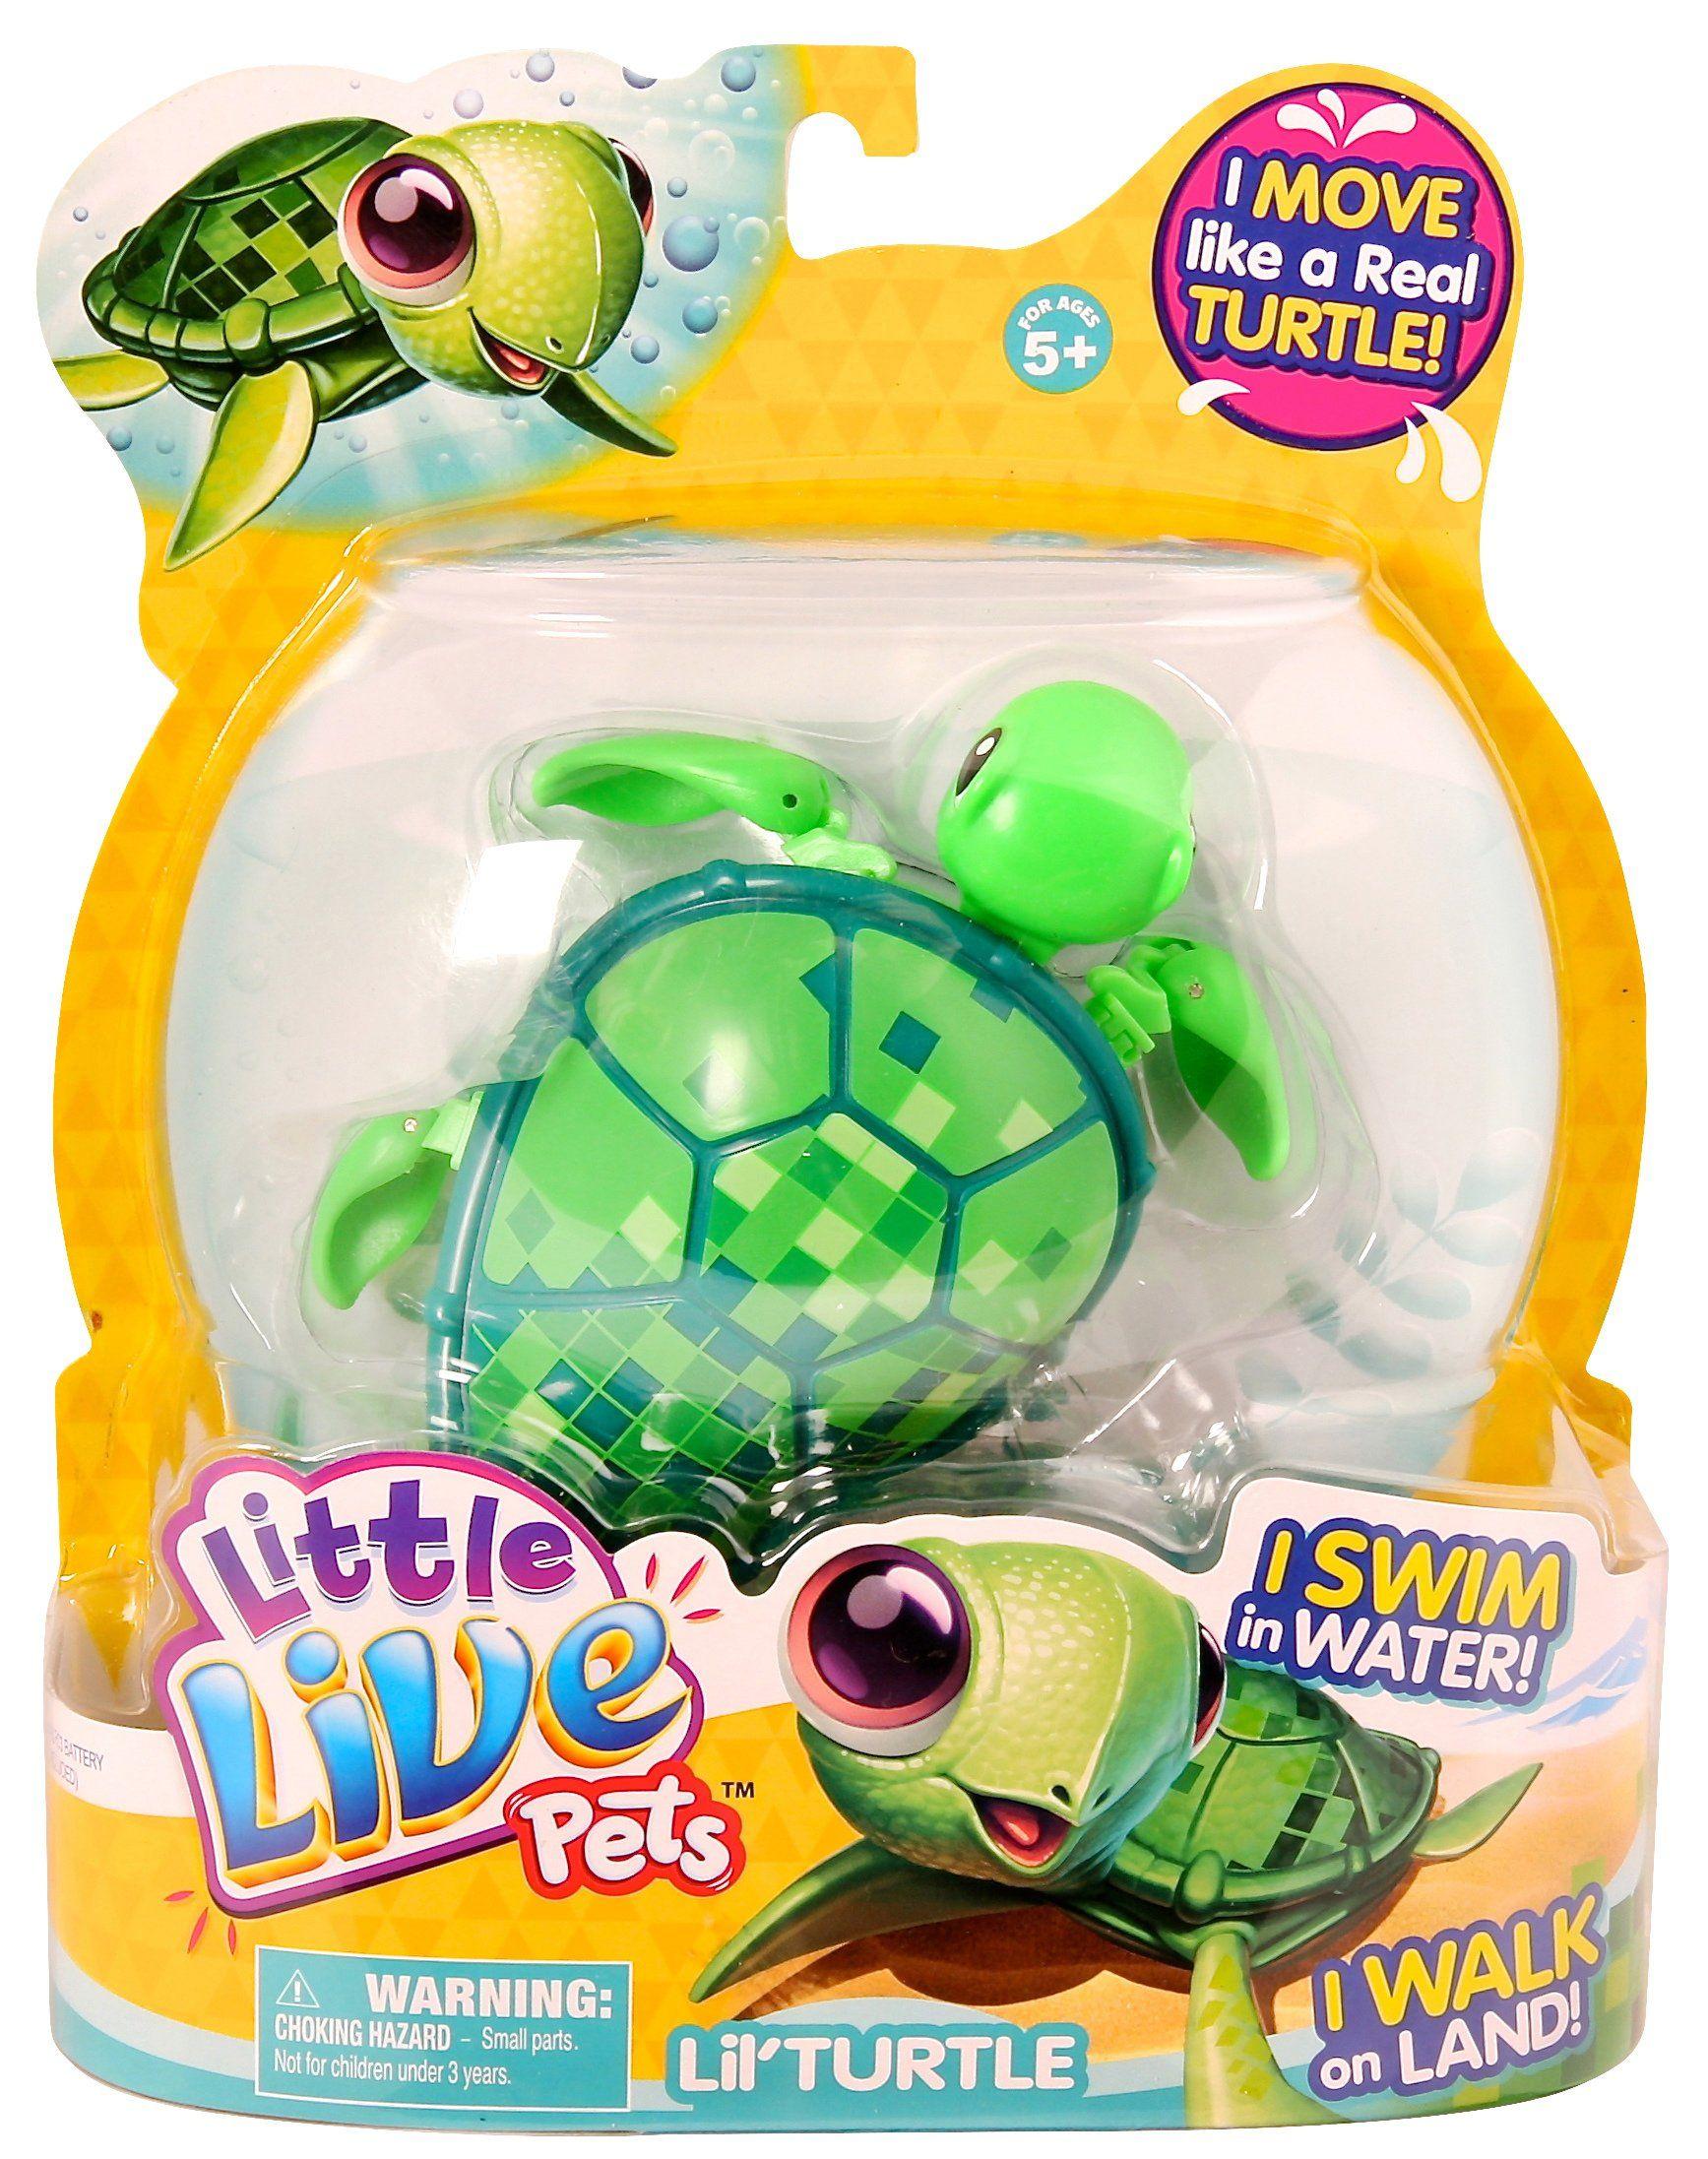 Tyler Loves The Little Live Pets Turtle Toy Little Live Pets